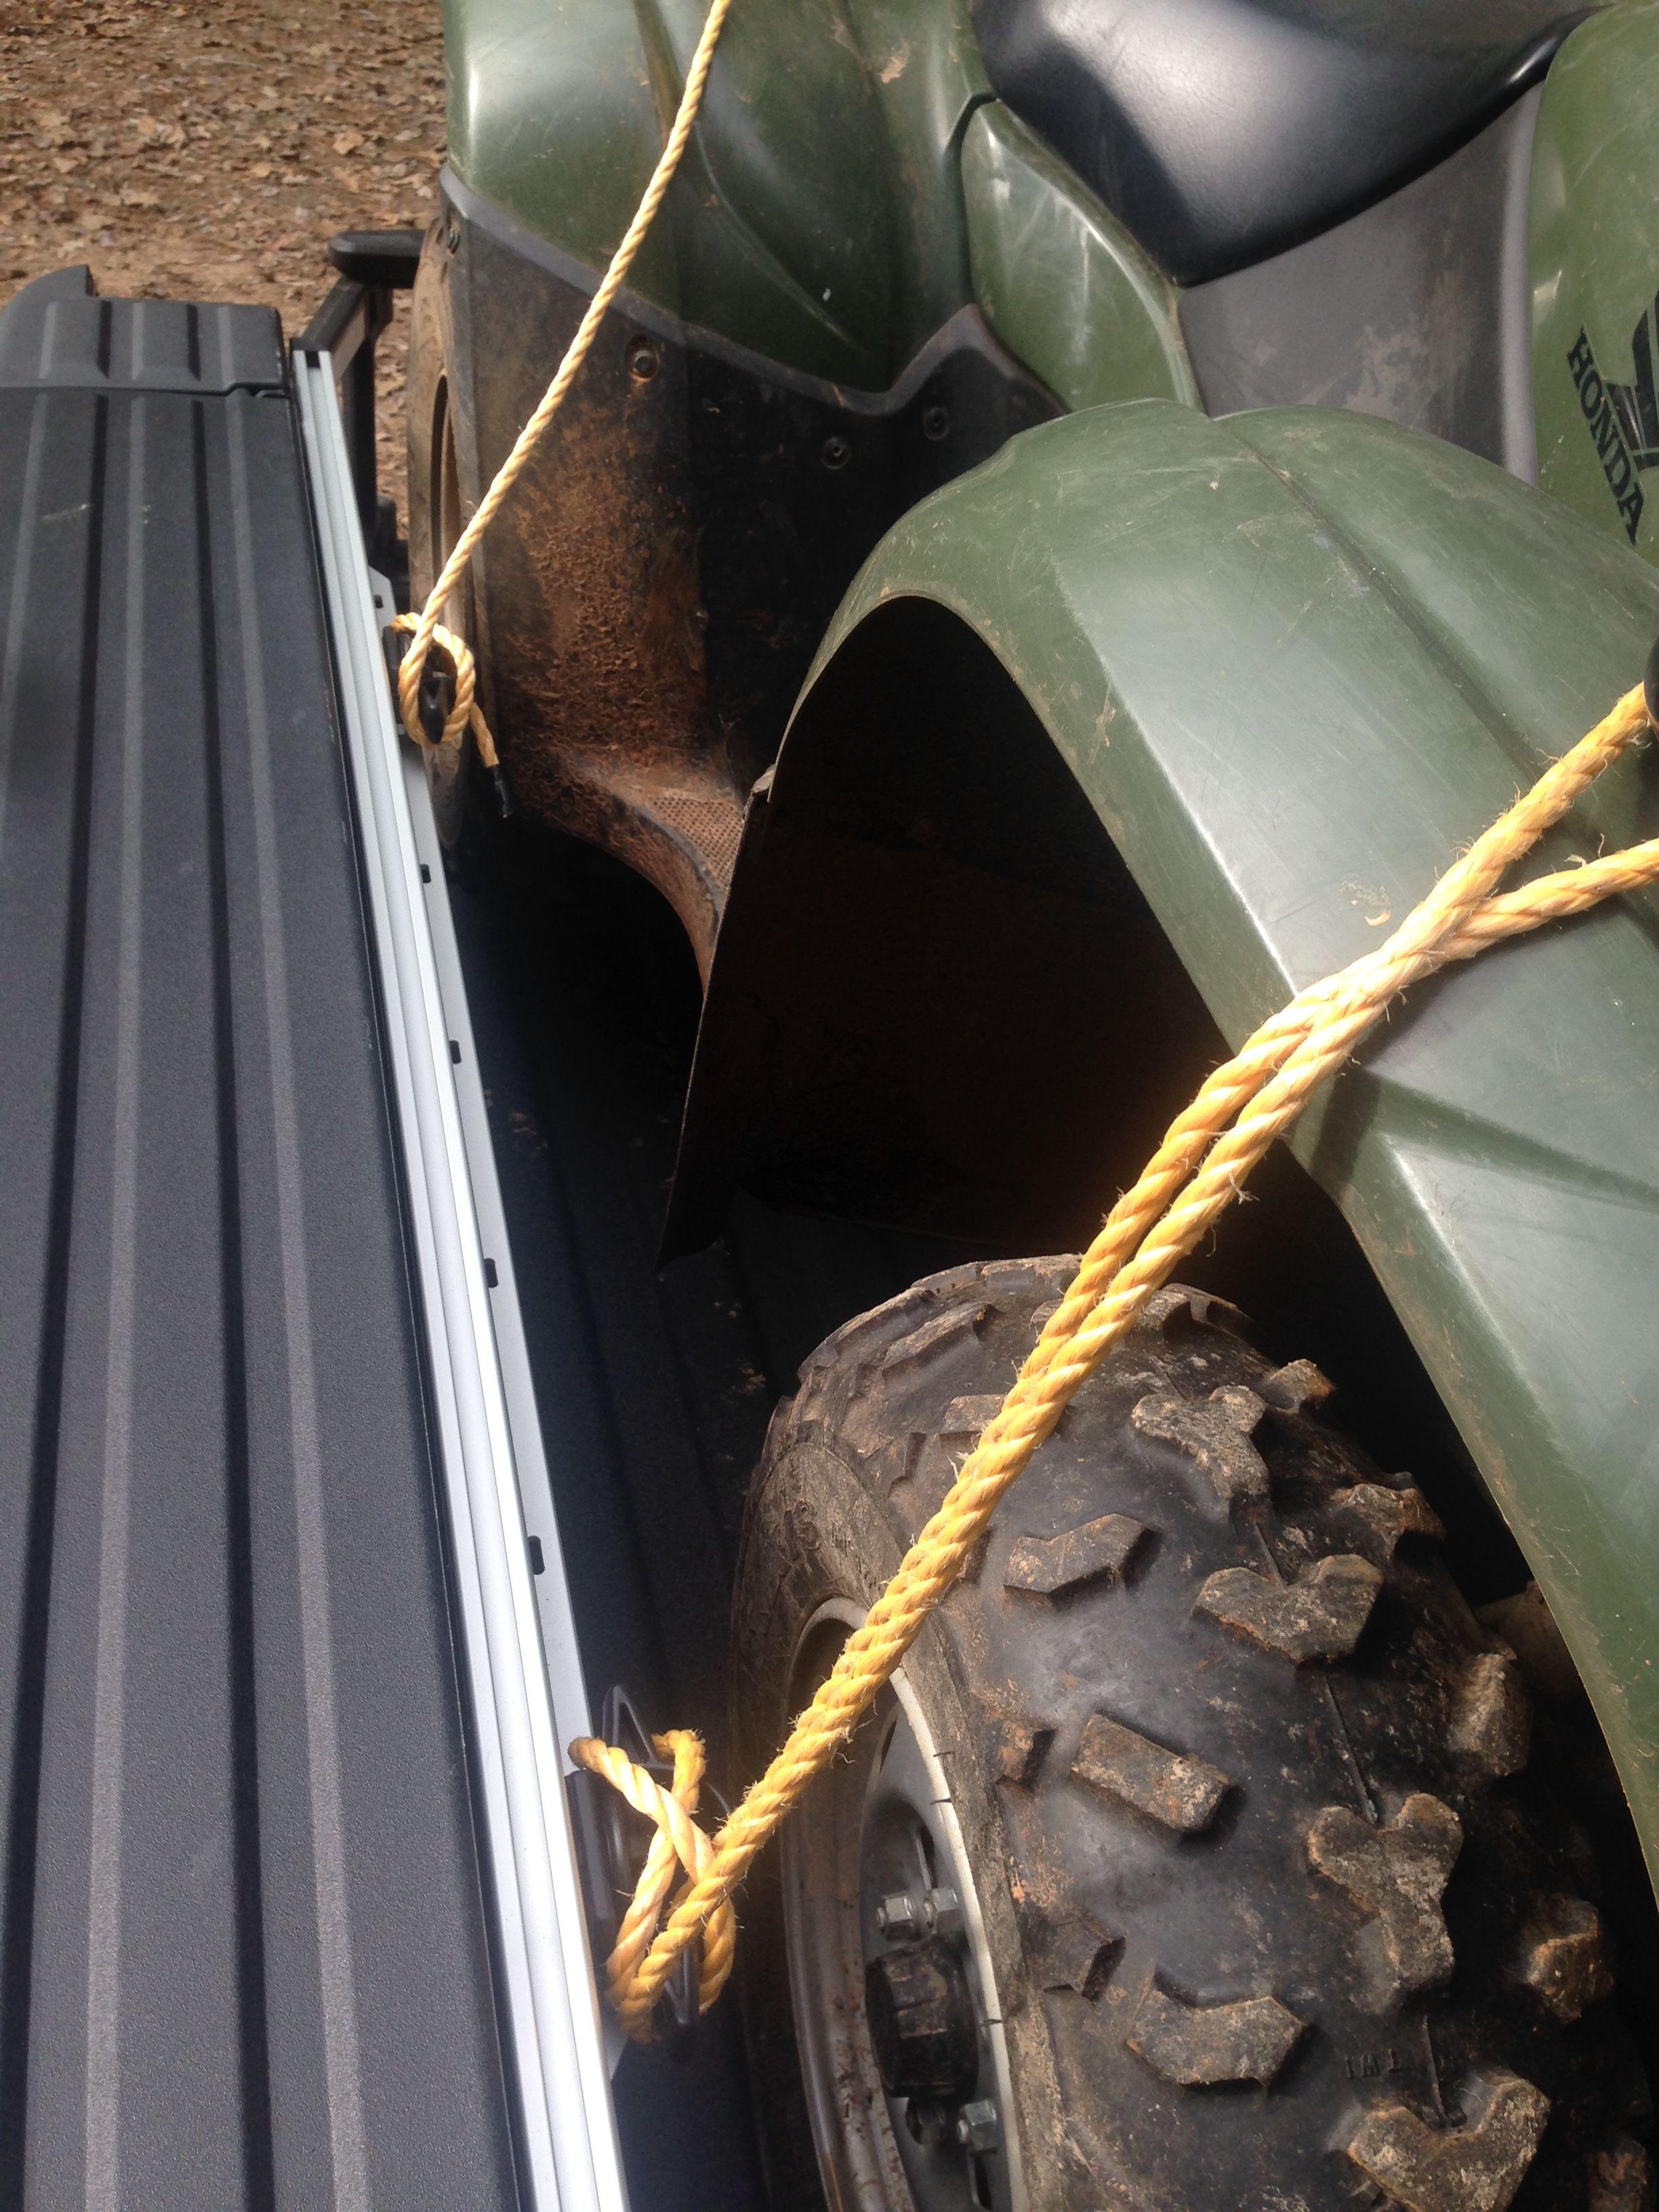 Rambox Cargo Management System  Ram Rebel 1500 4x4 Hemi | Deer Hunt East Texas |#Ram #Rebel #Hemi #RamLife #HondaATV #TheFlashList #ScottTilley | #AutoReview http://www.theflashlist.com/assets/brands/automotive/ram/2015/1500/reviews/scotttilley/dallas.html